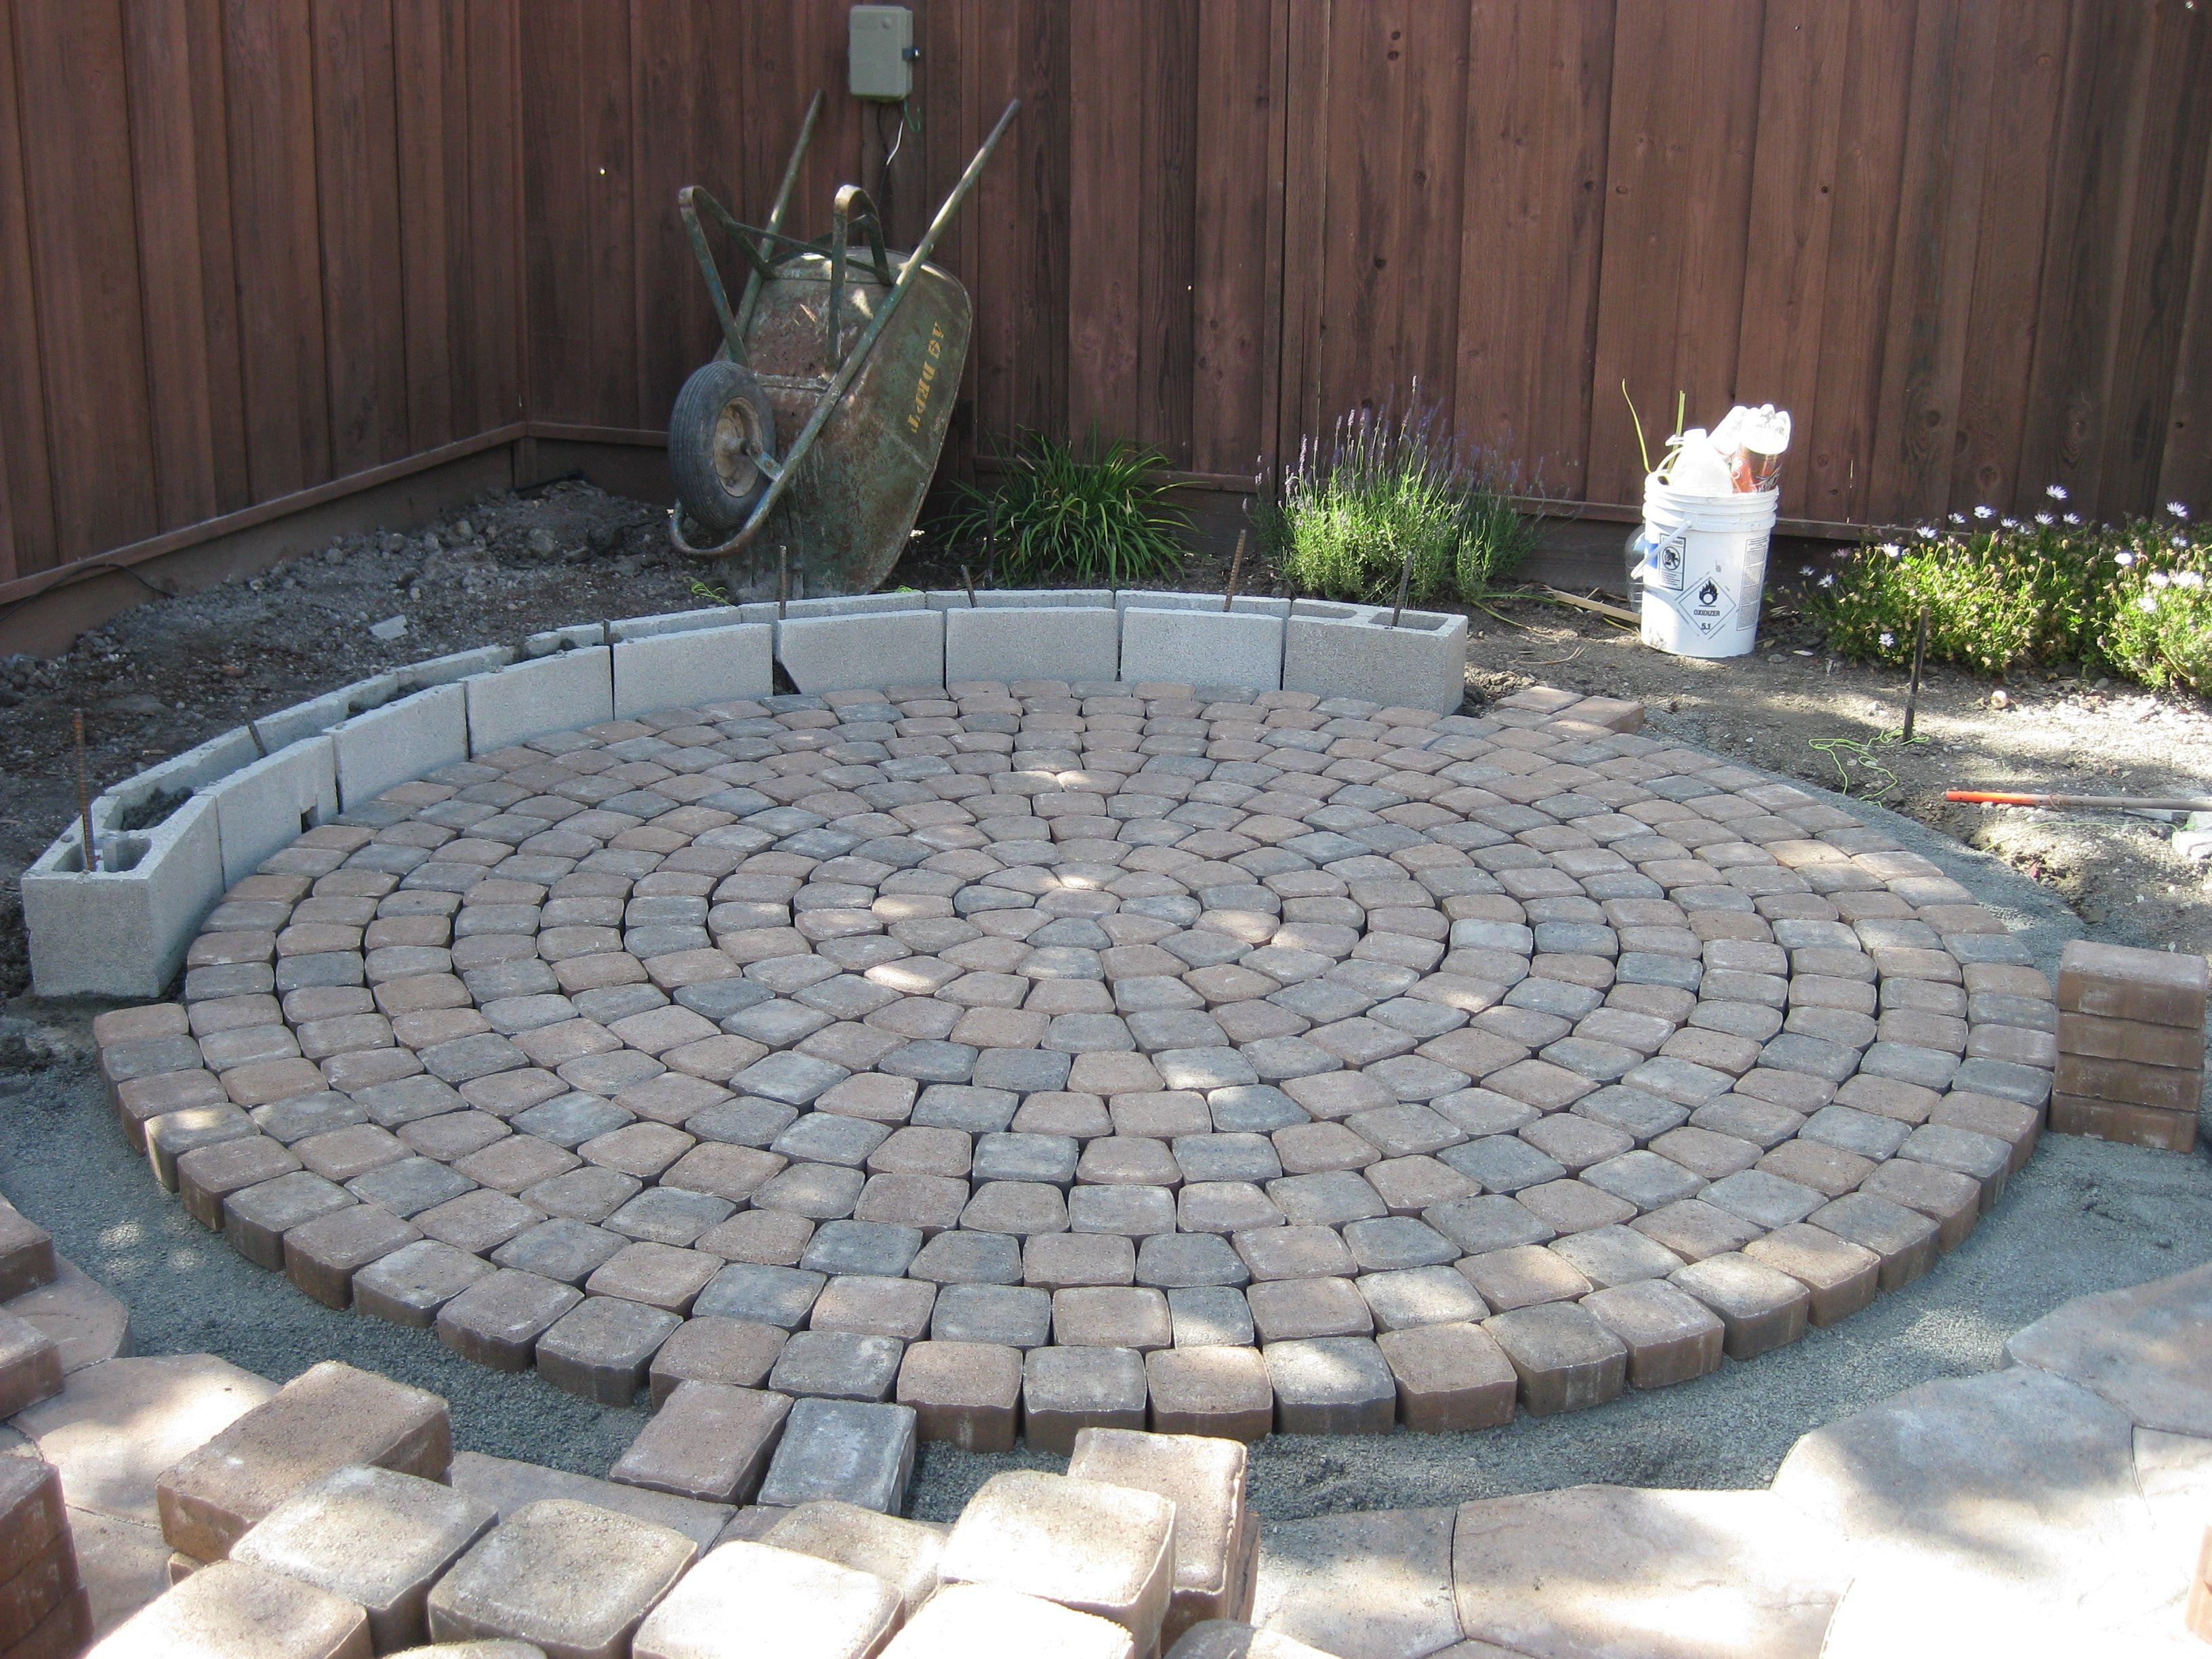 Medium Of Round Stepping Stones